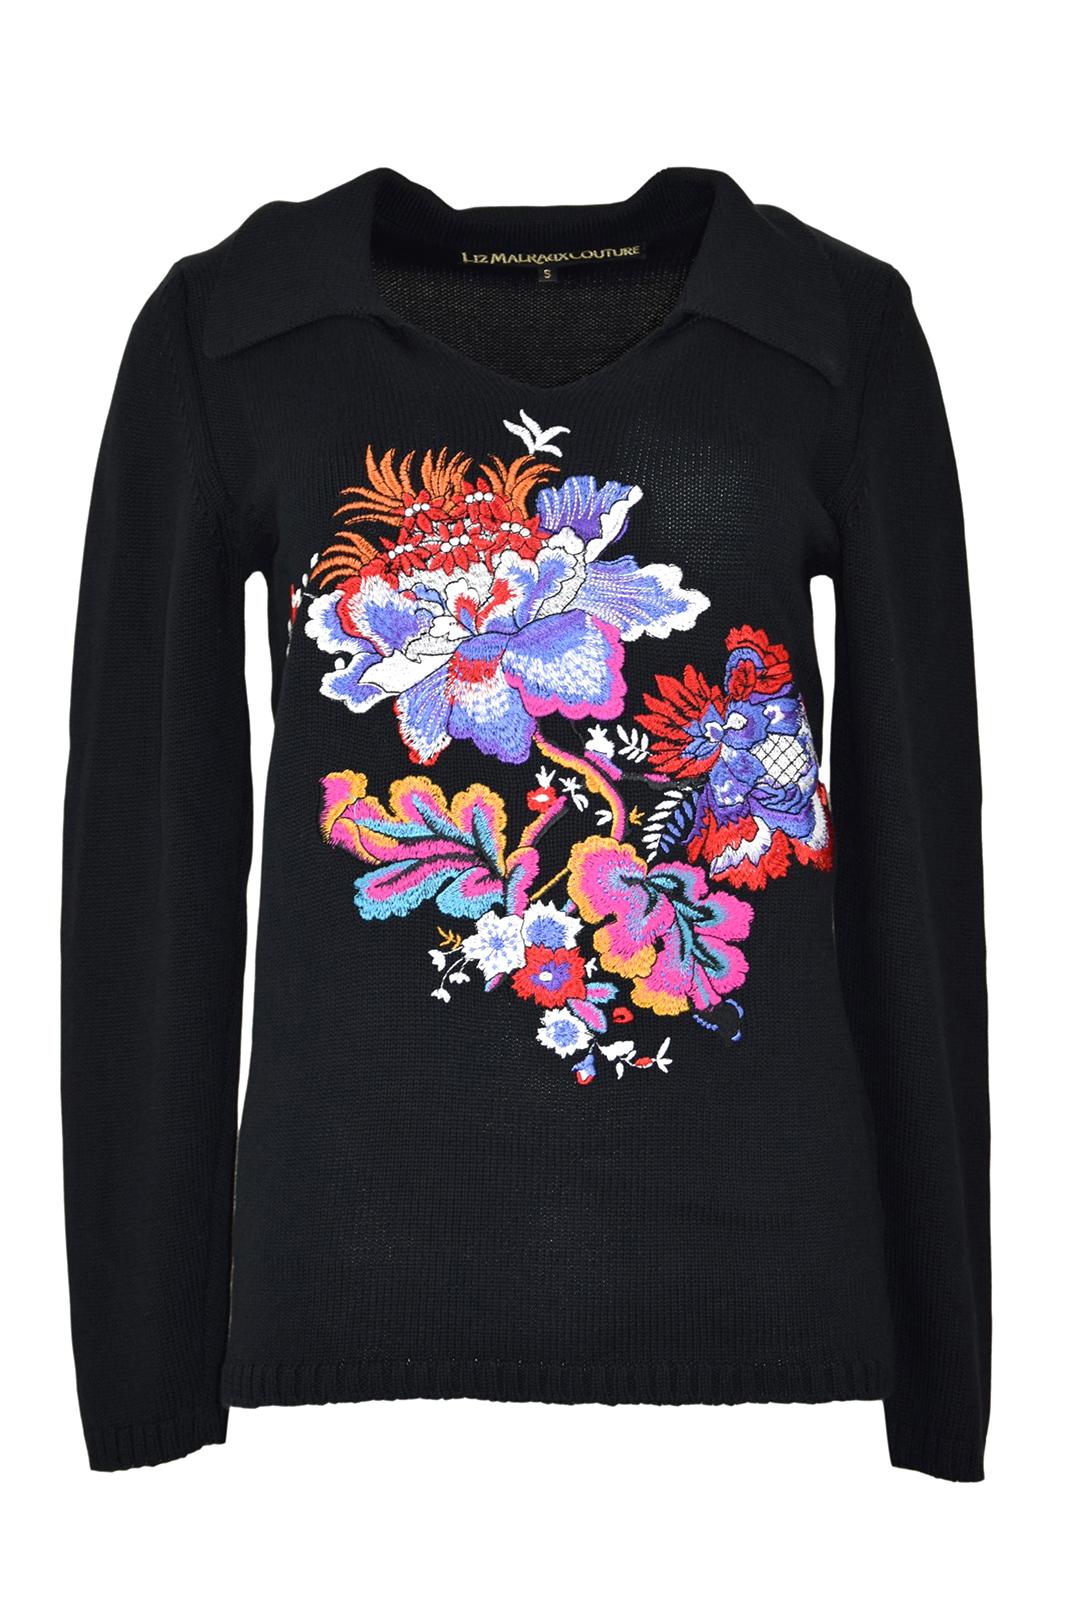 "Pulli mit ""maxi-paisley-embroidery"", 100% Baumwolle"